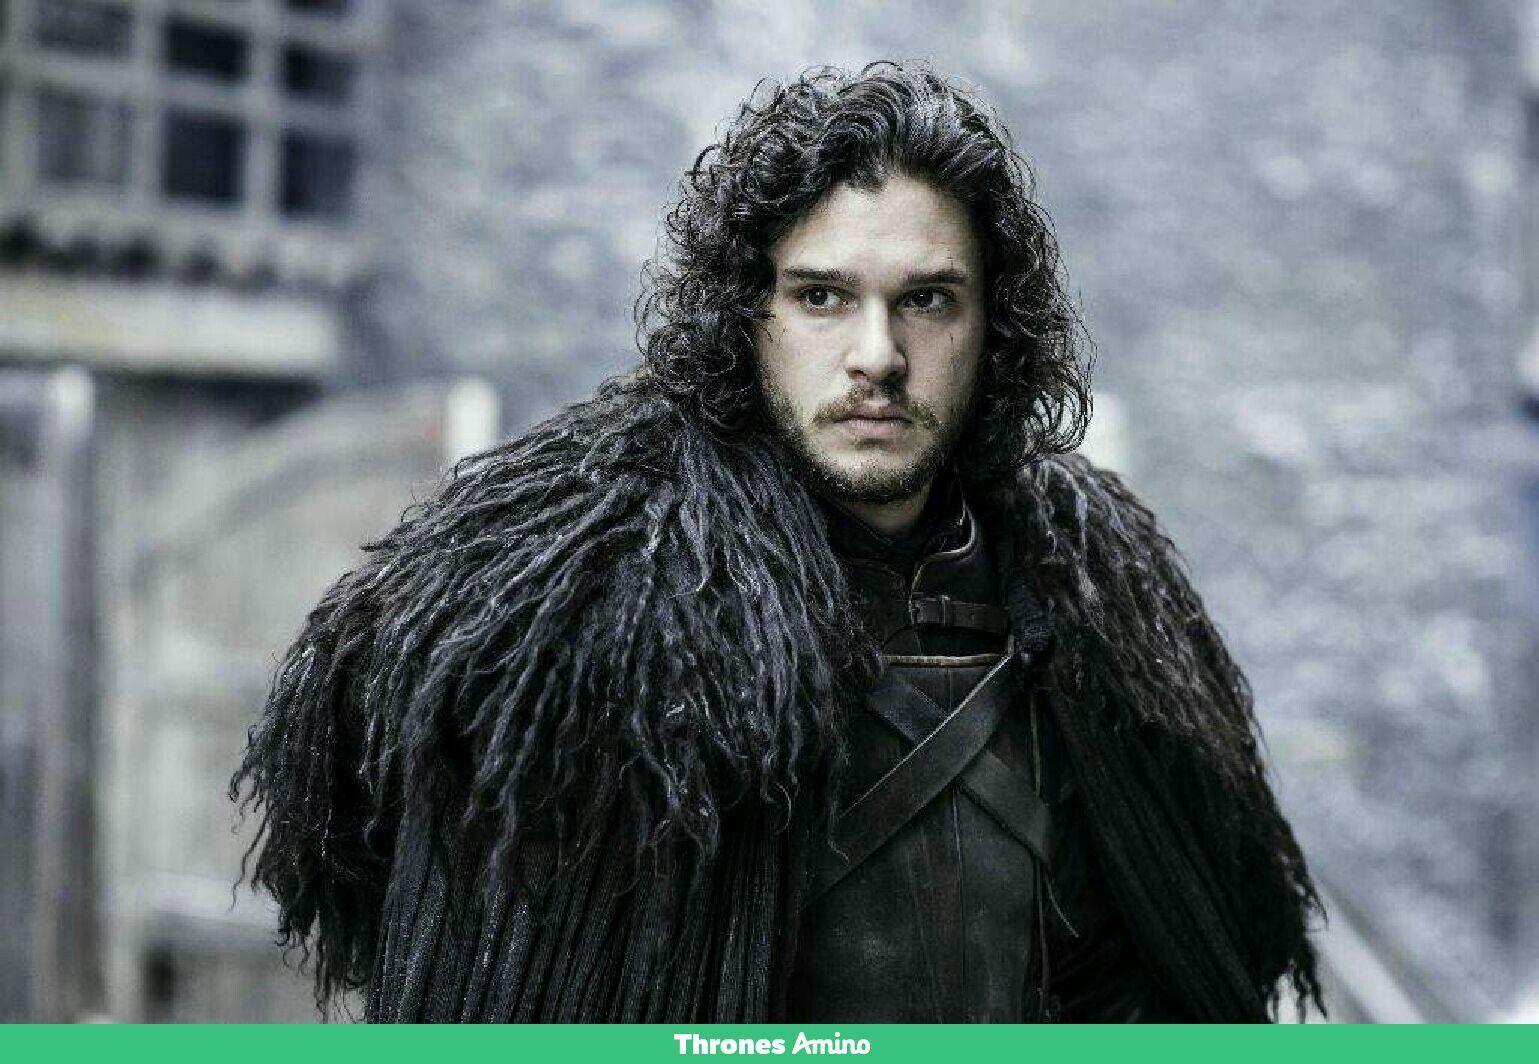 Oh Jon No More Crow For You Yaaaasss Jon Snow Dead Game Of Thrones Theories Jon Snow